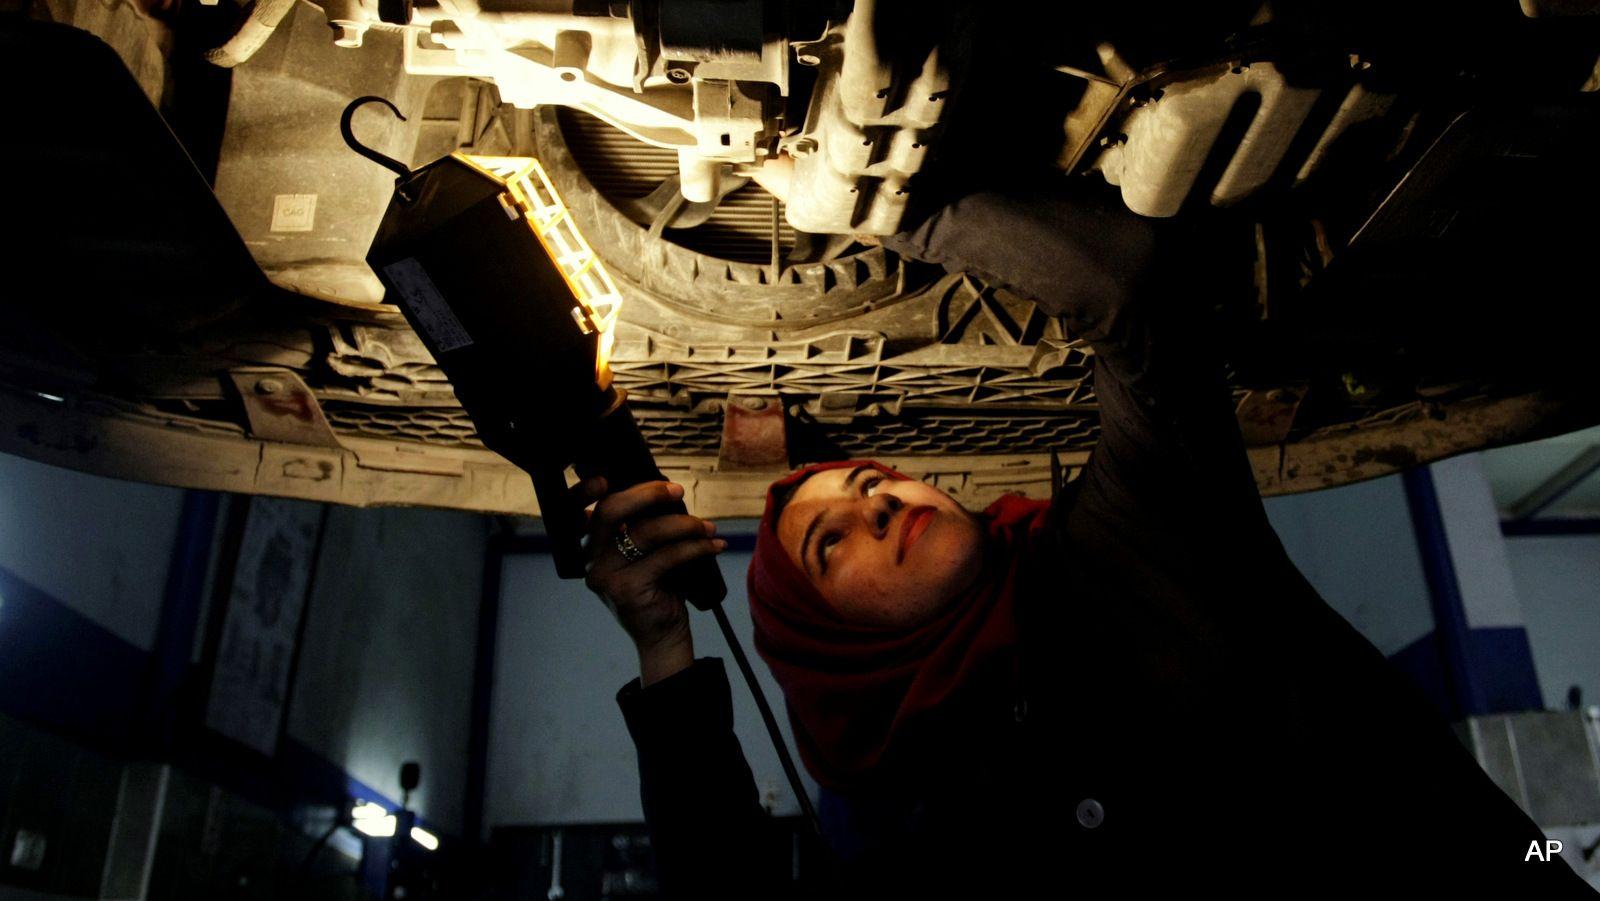 Palestinian auto mechanic Nagham Dweikat checks the bottom of a vehicle at a repair shop